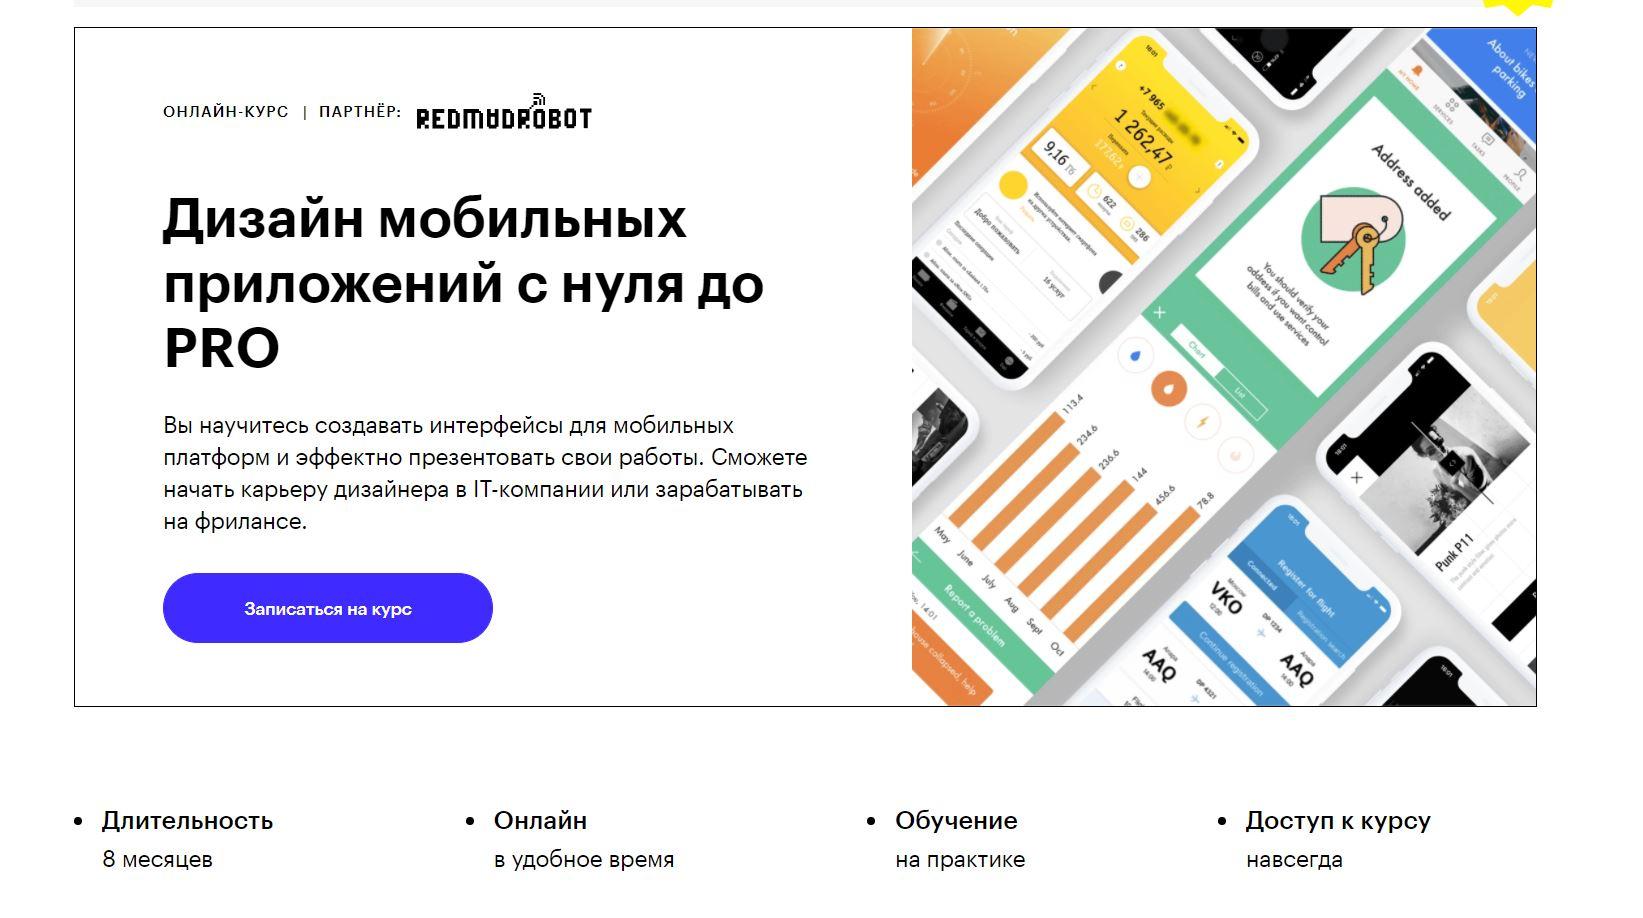 skillbox курс Дизайнер мобильных приложений